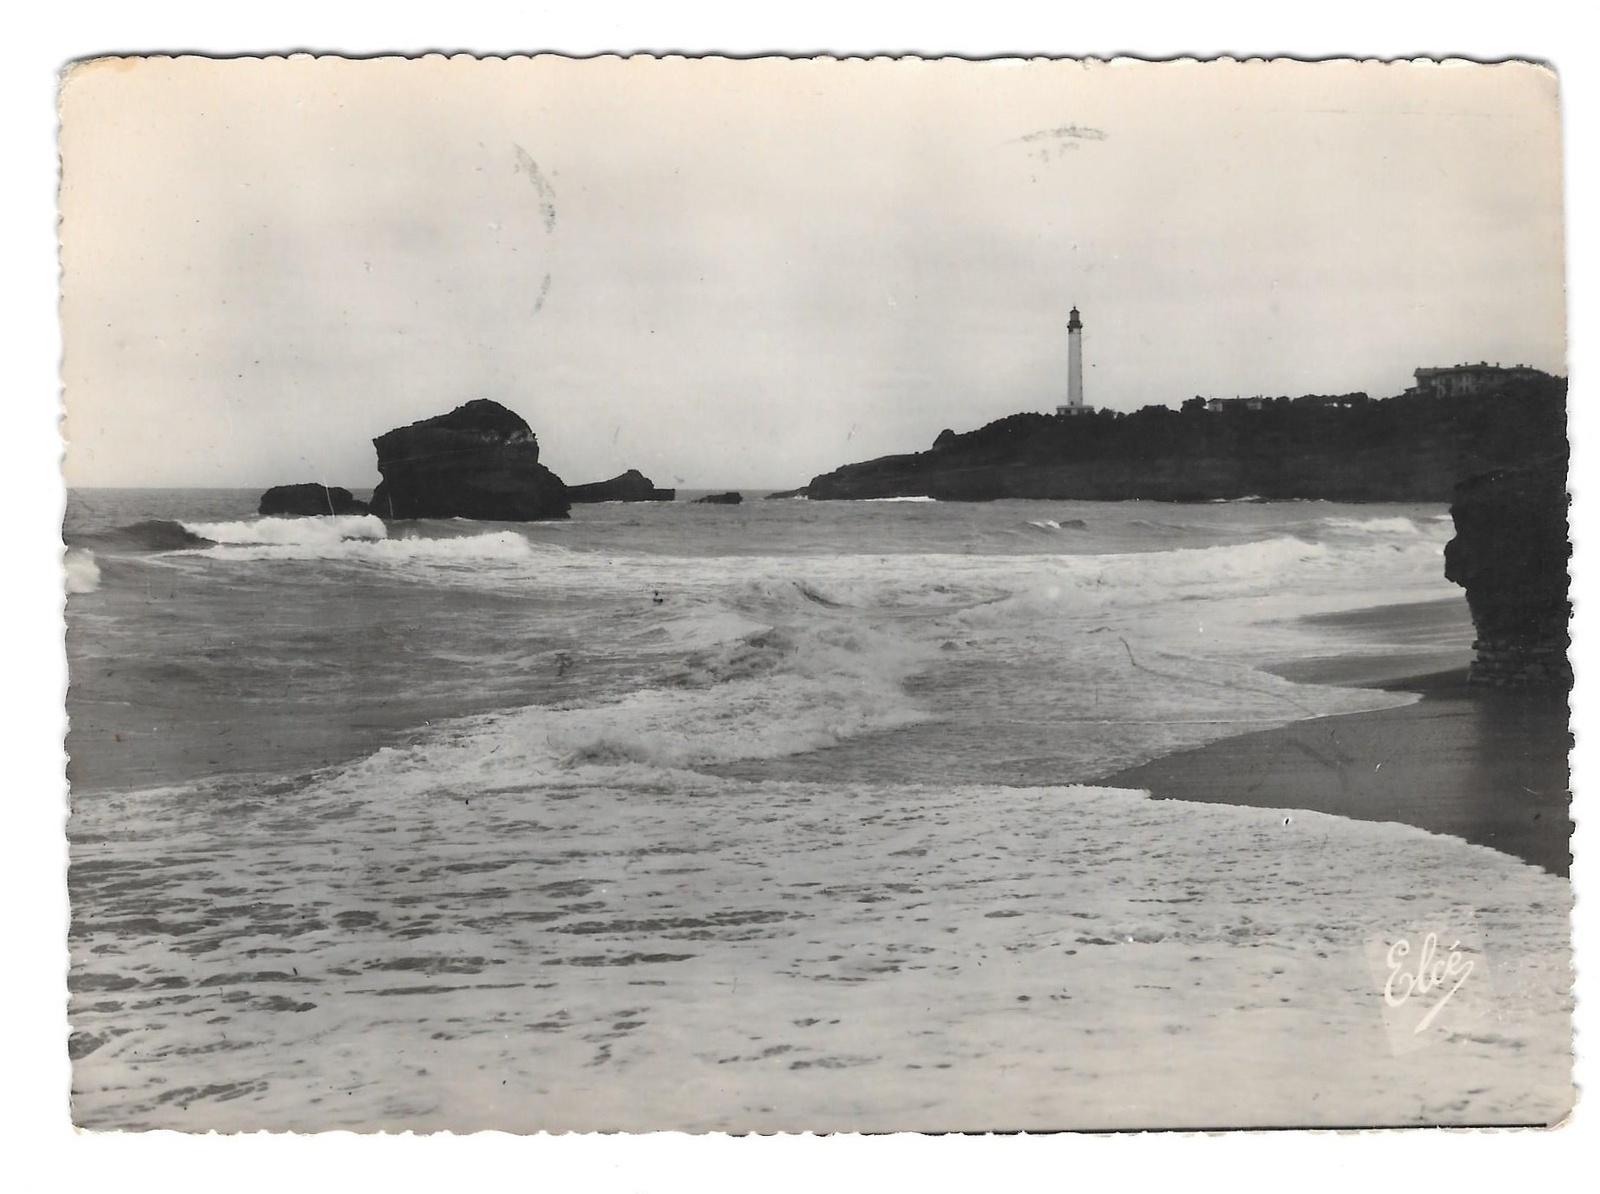 97 3025 ea france biarritz grande plage beach